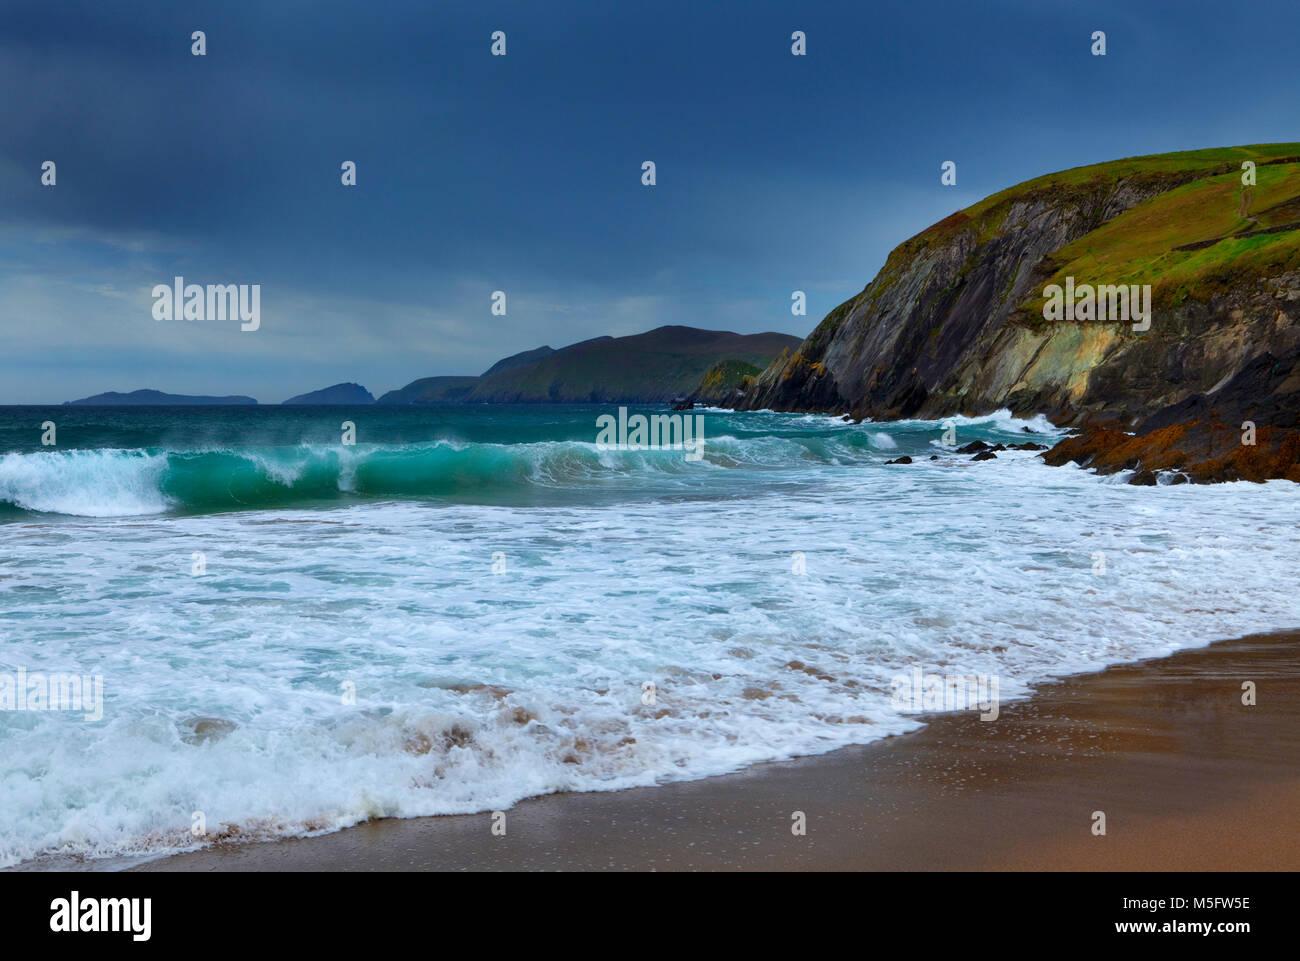 Coumeenoole Beach at Slea Head, Dingle Peninsula, County Kerry, Ireland - Stock Image